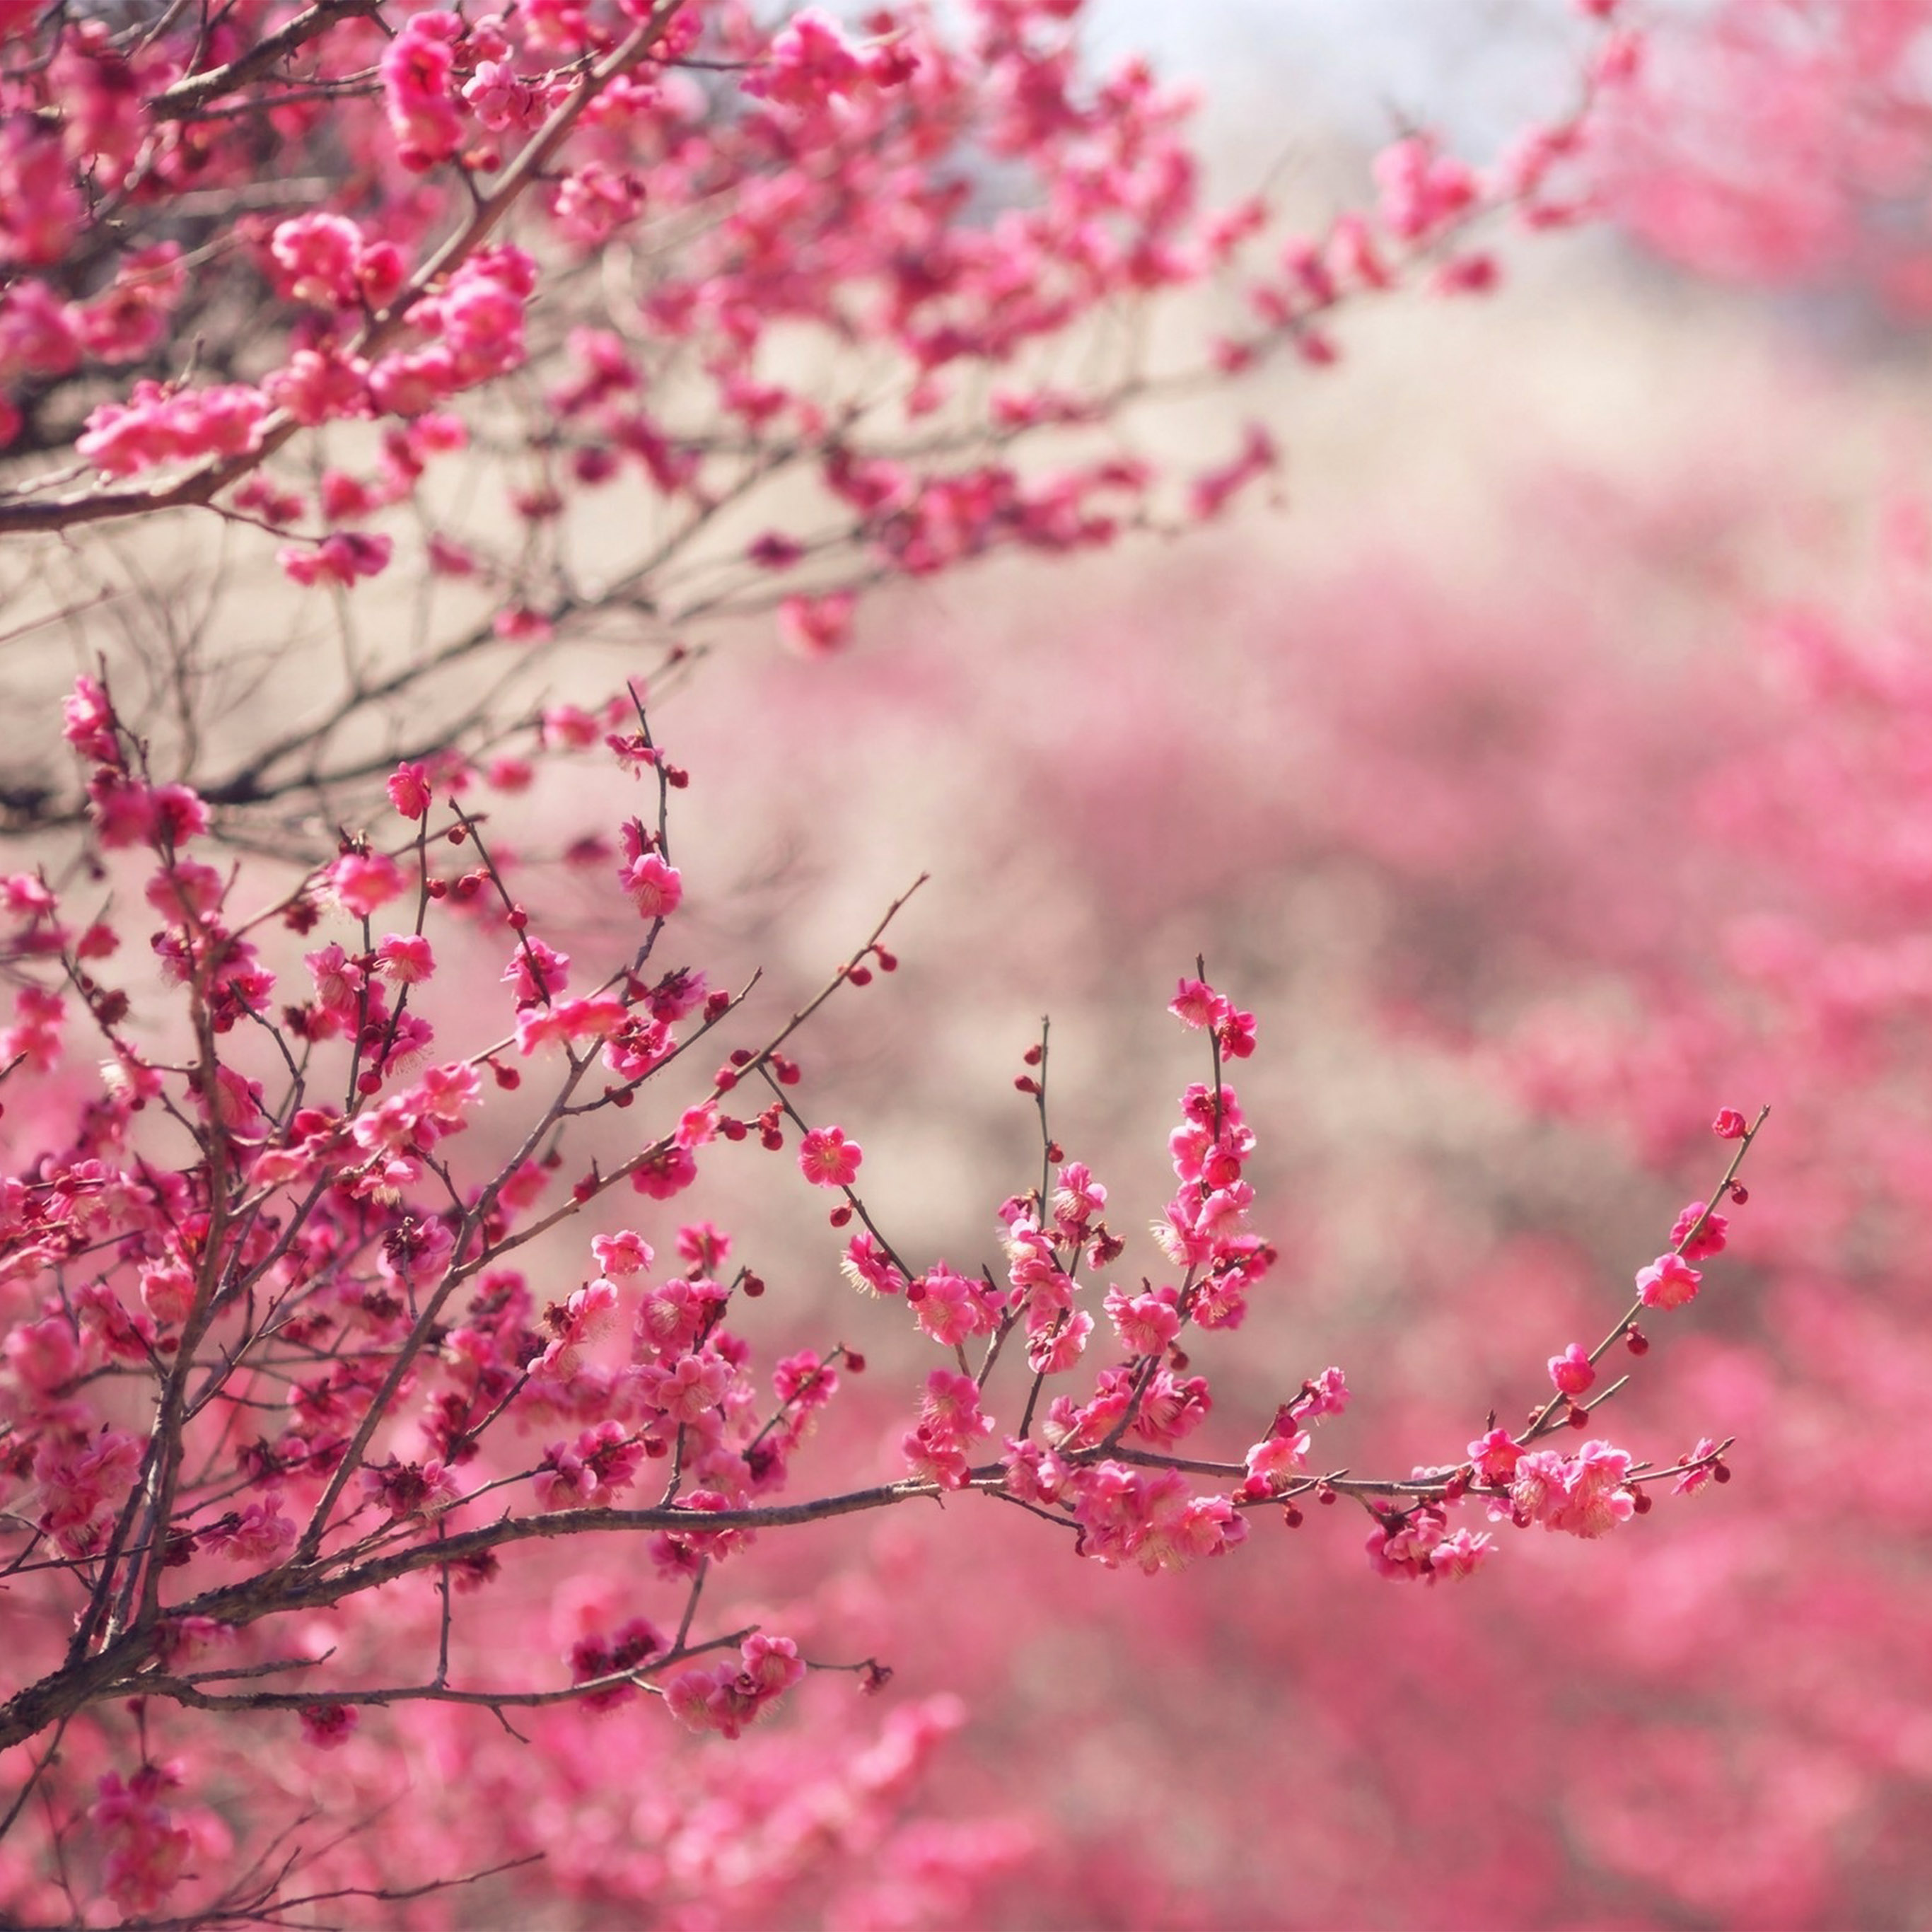 nf14-pink-blossom-nature-flower-spring-wallpaper